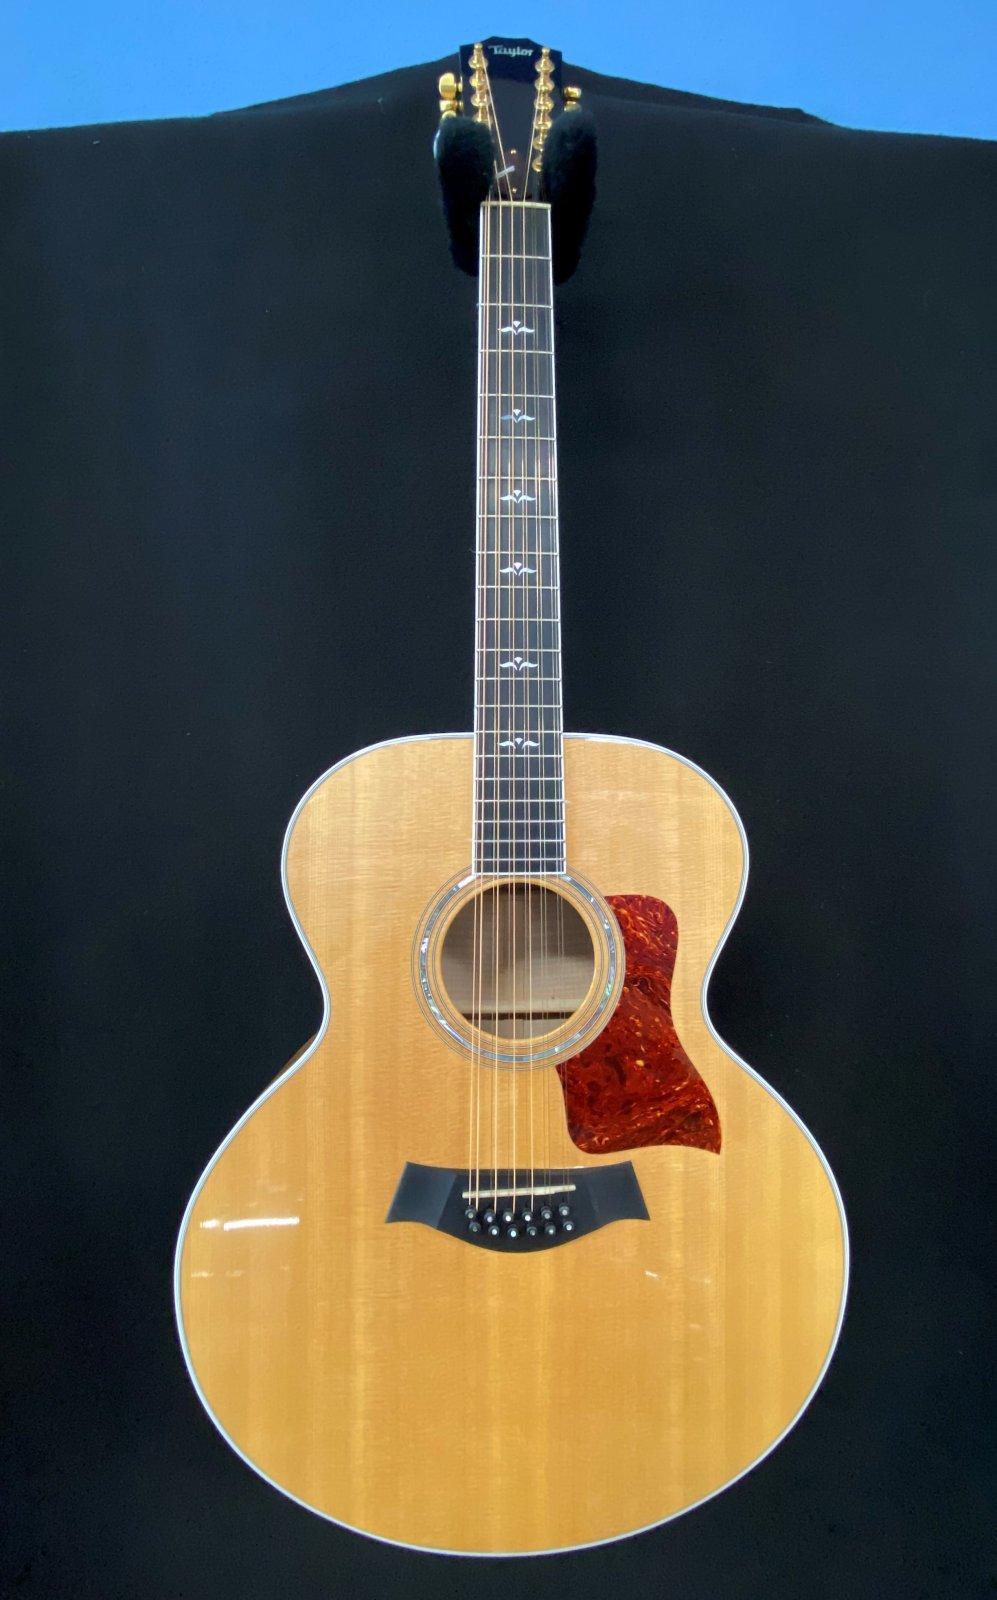 Taylor 655 12 string